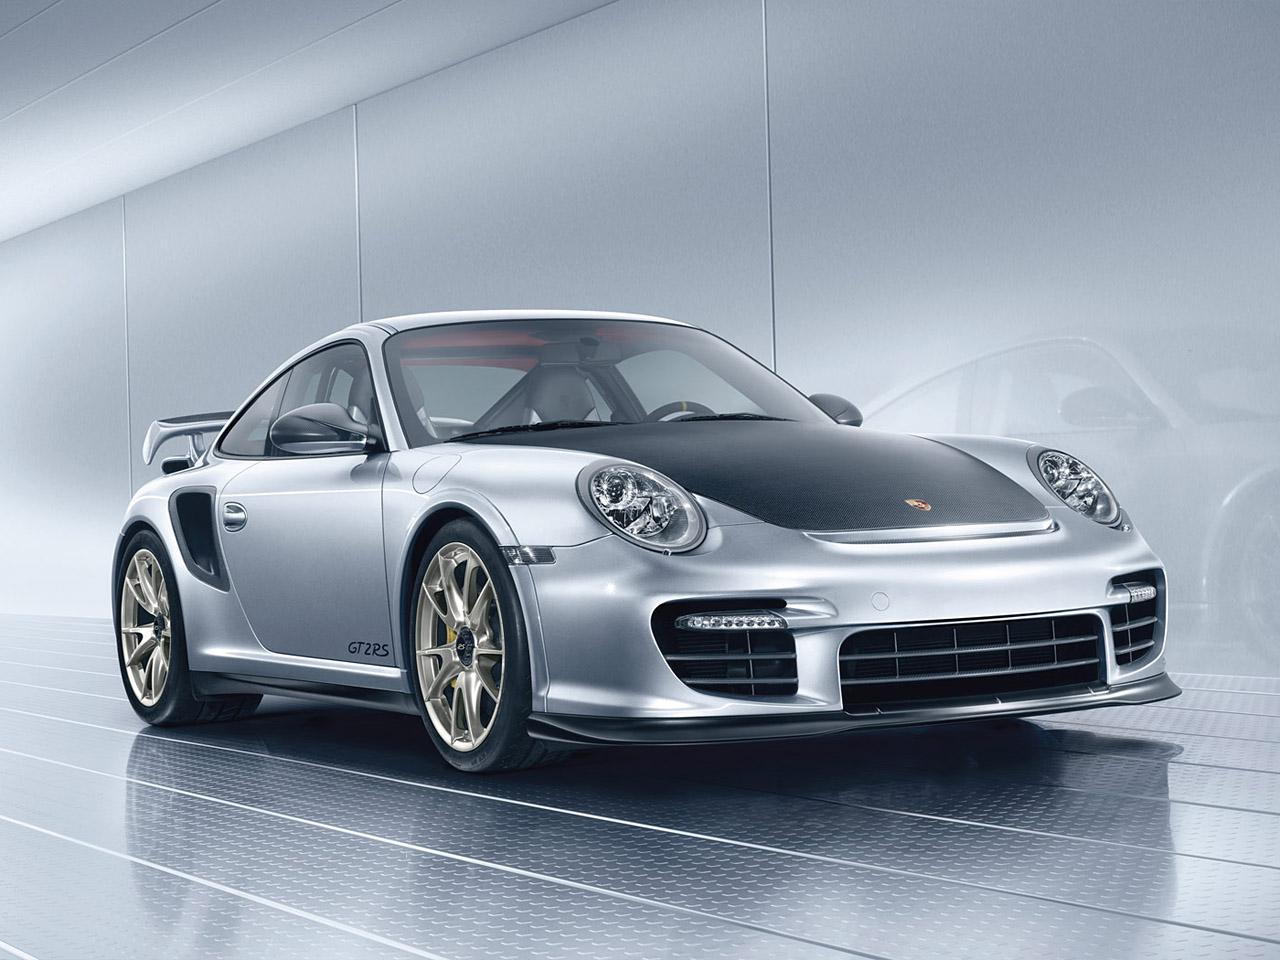 2011 twin turbo porsche 911 gt2 rs gambar wallpaper mobil sport. Black Bedroom Furniture Sets. Home Design Ideas